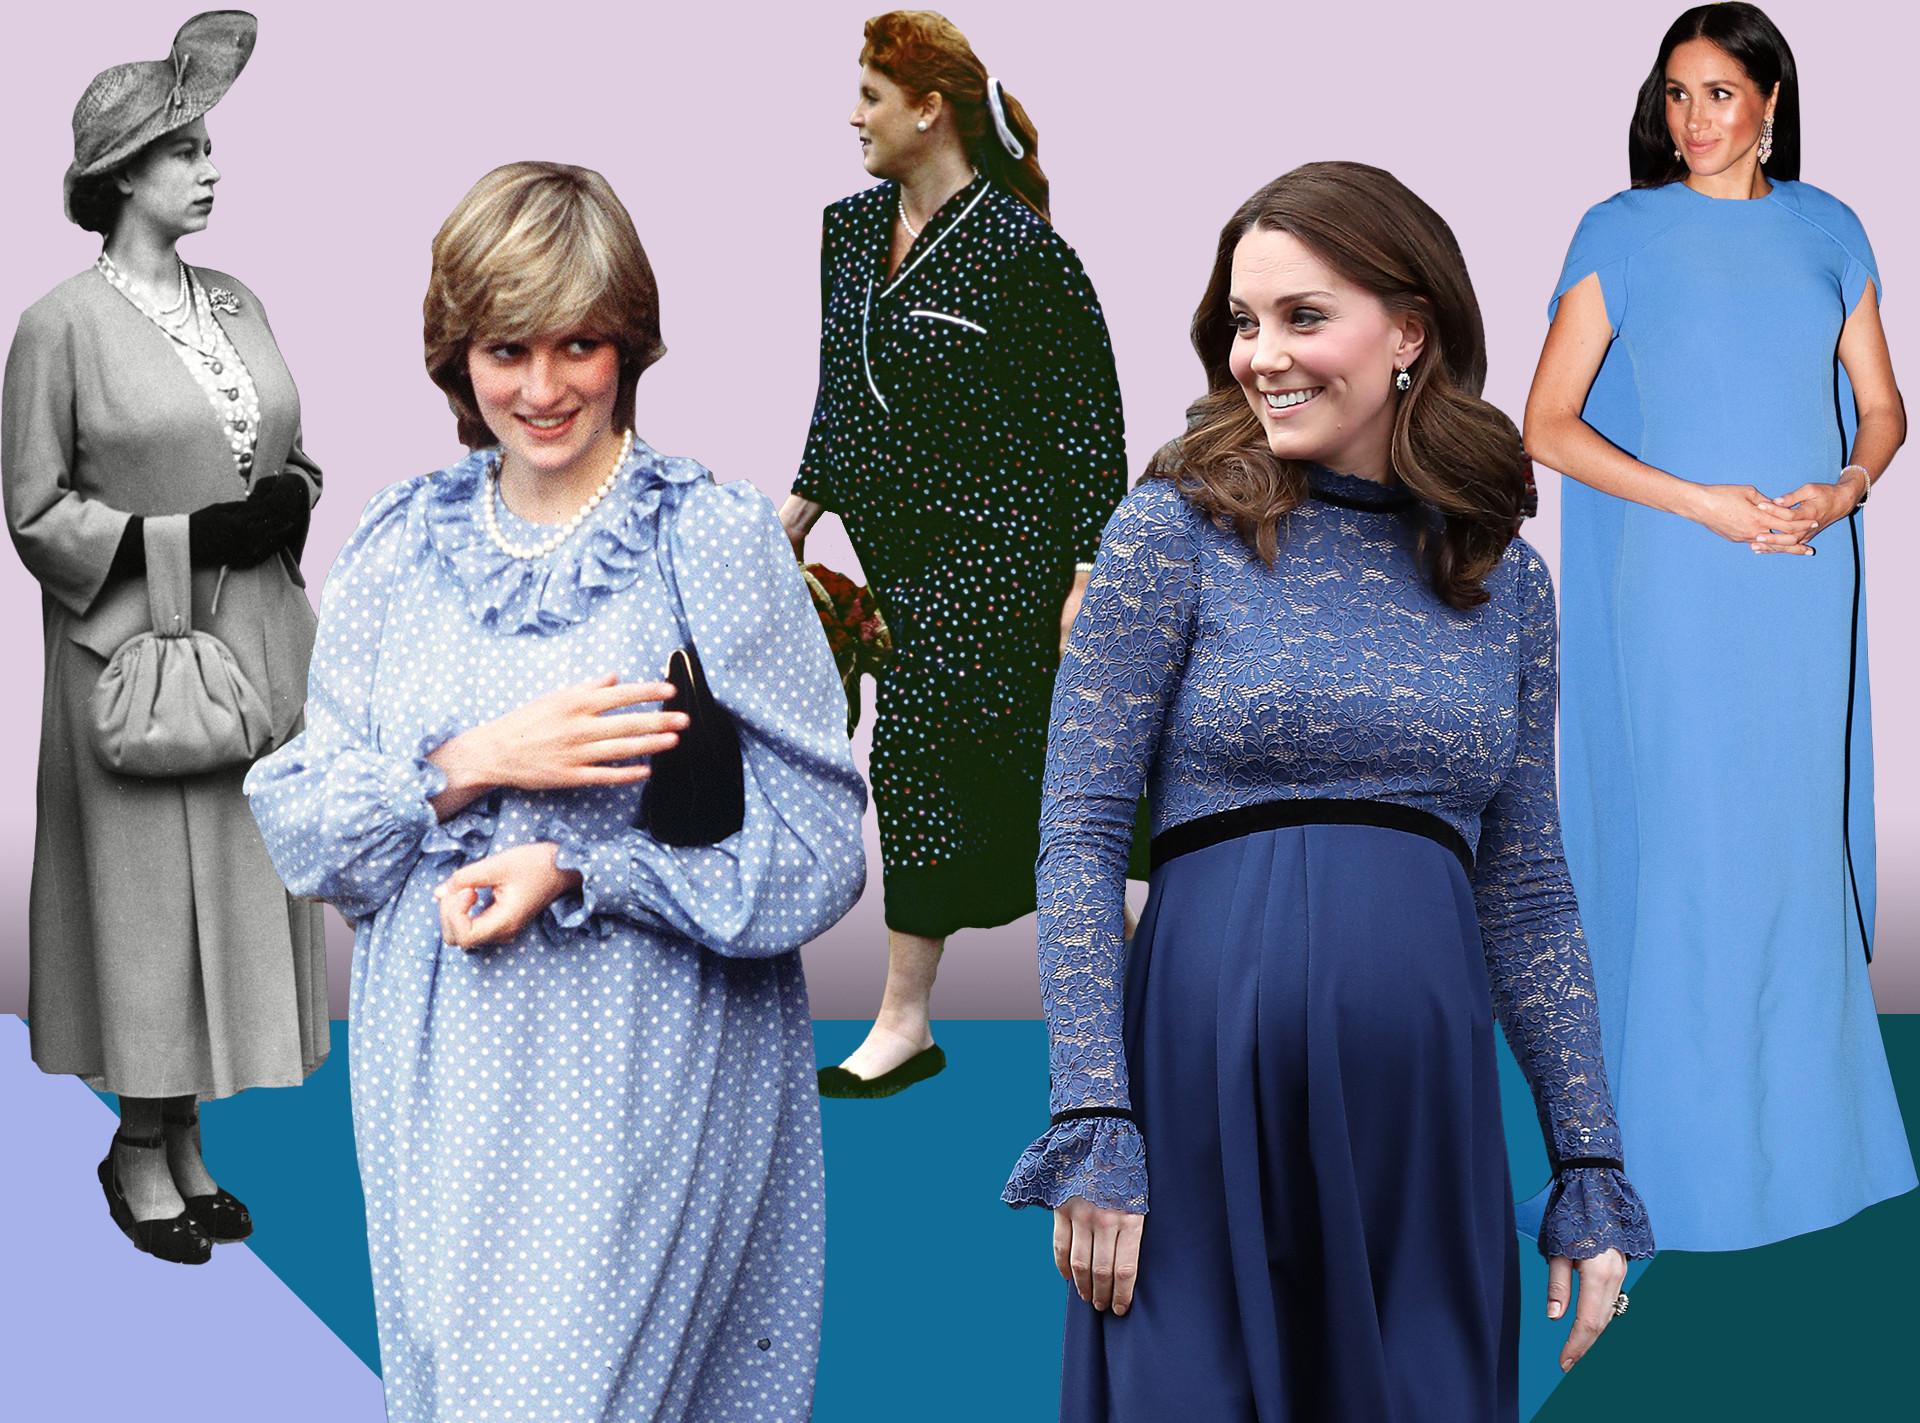 Royal Pregnancies, Queen Elizabeth II, Princess Diana, Sarah Ferguson, Kate Middleton, Meghan Markle